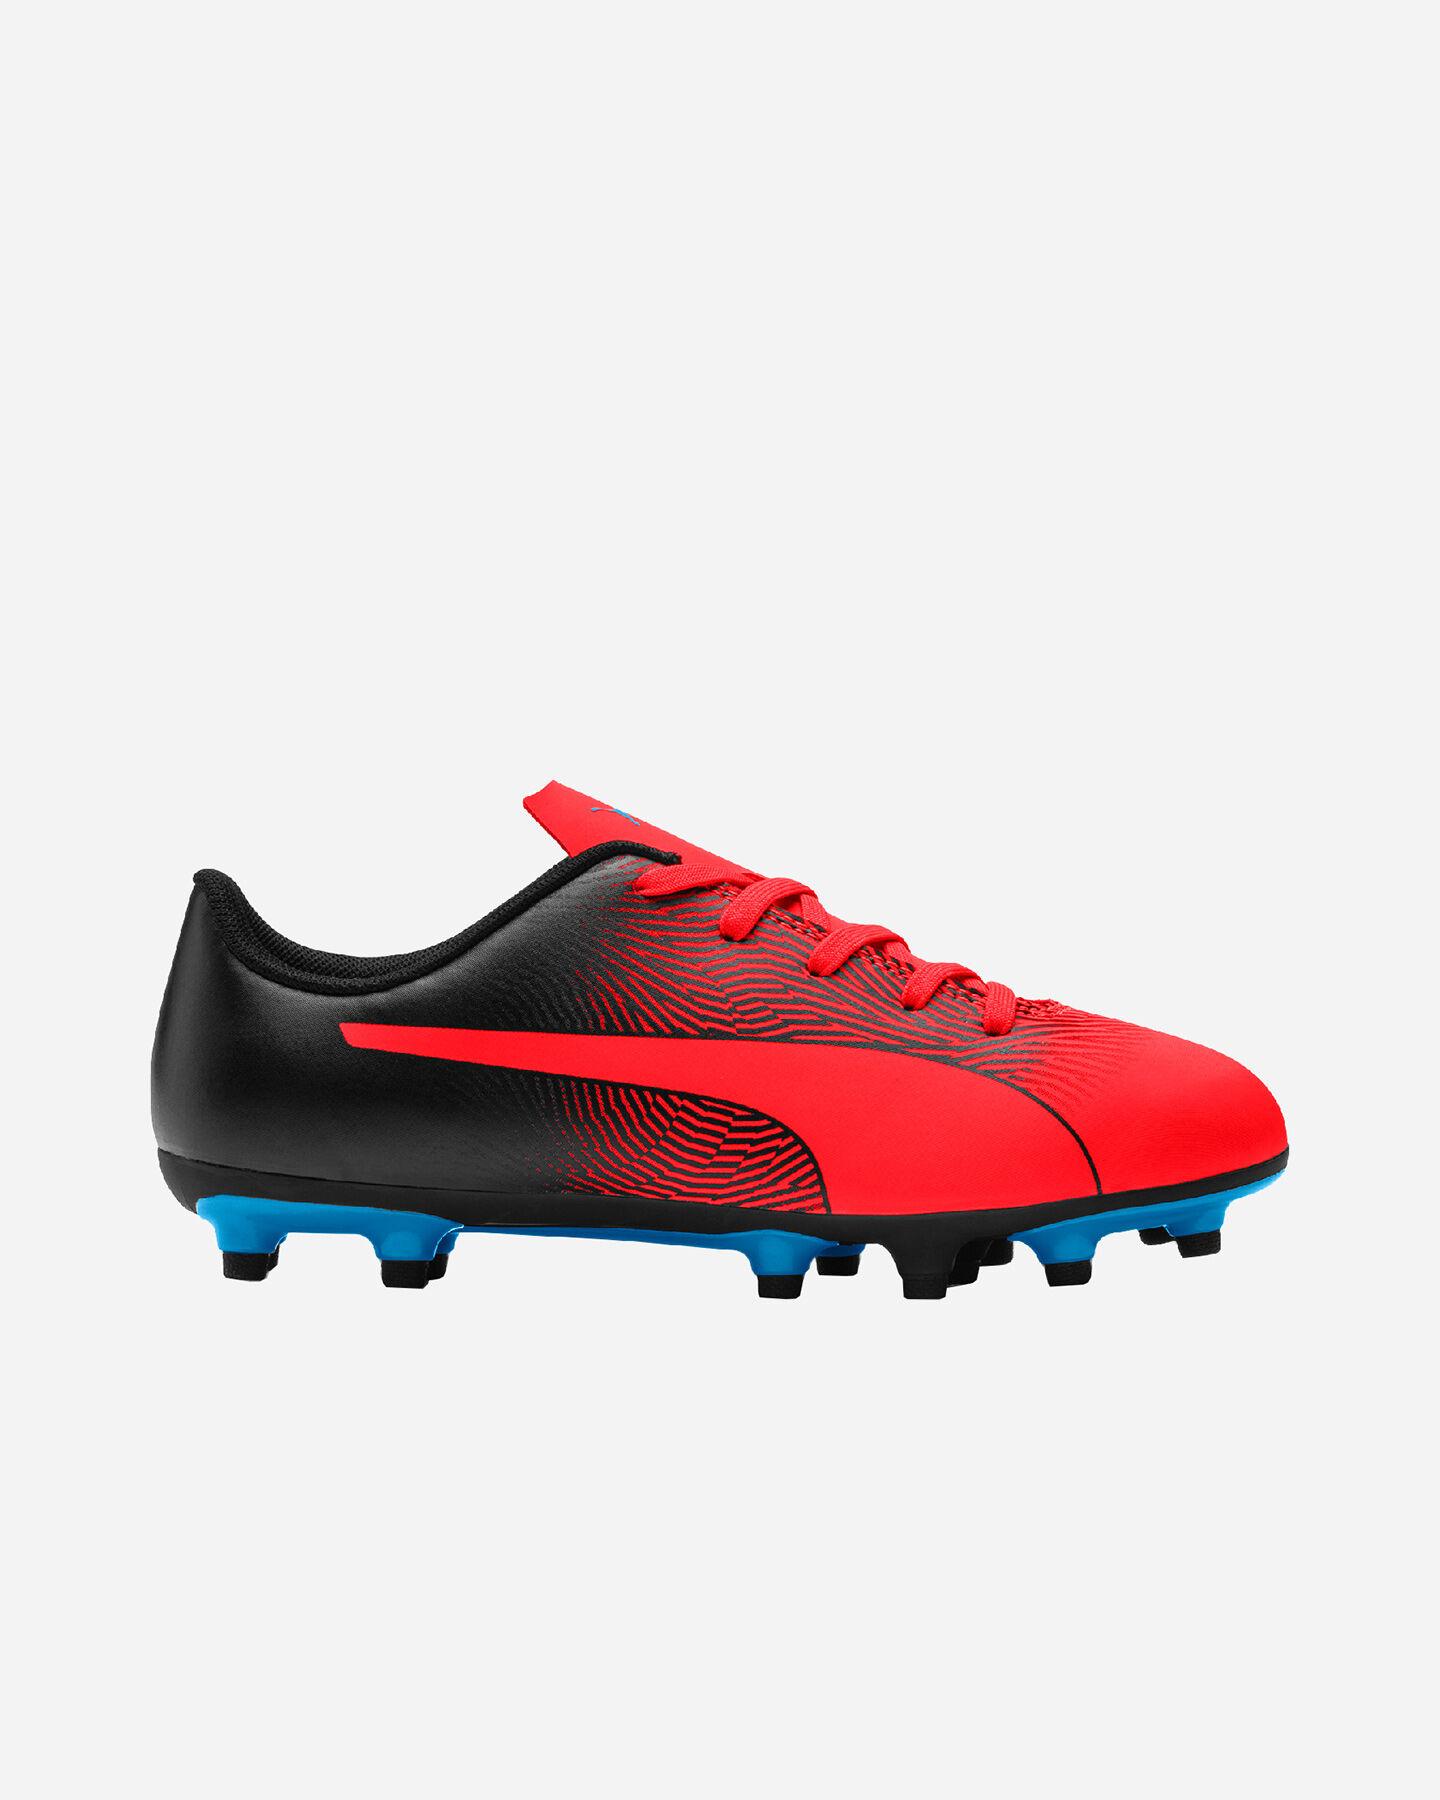 scarpe nike calcio cr7 bambini